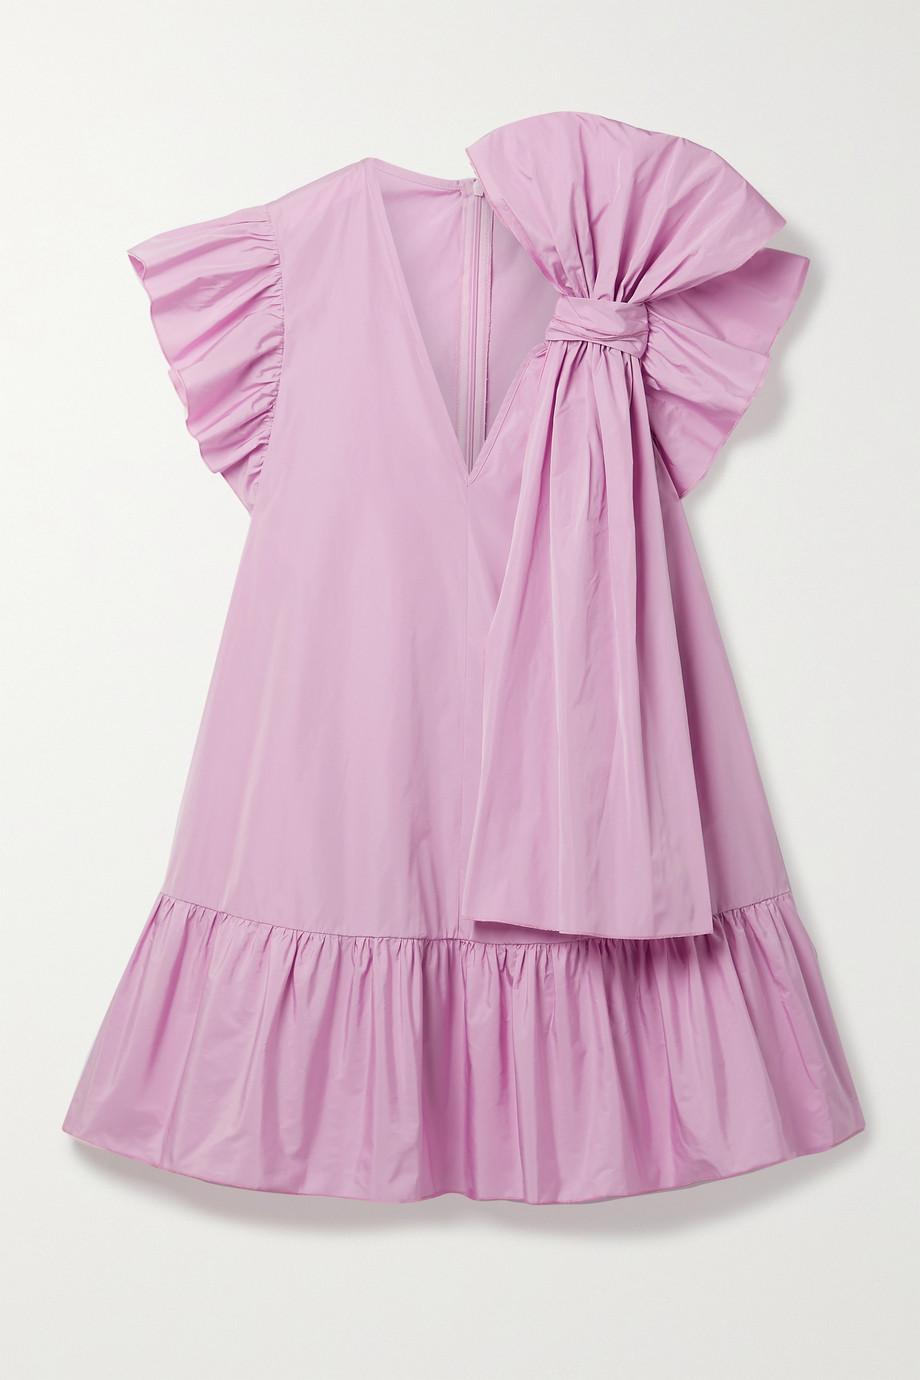 REDValentino Bow-embellished ruffled shell mini dress